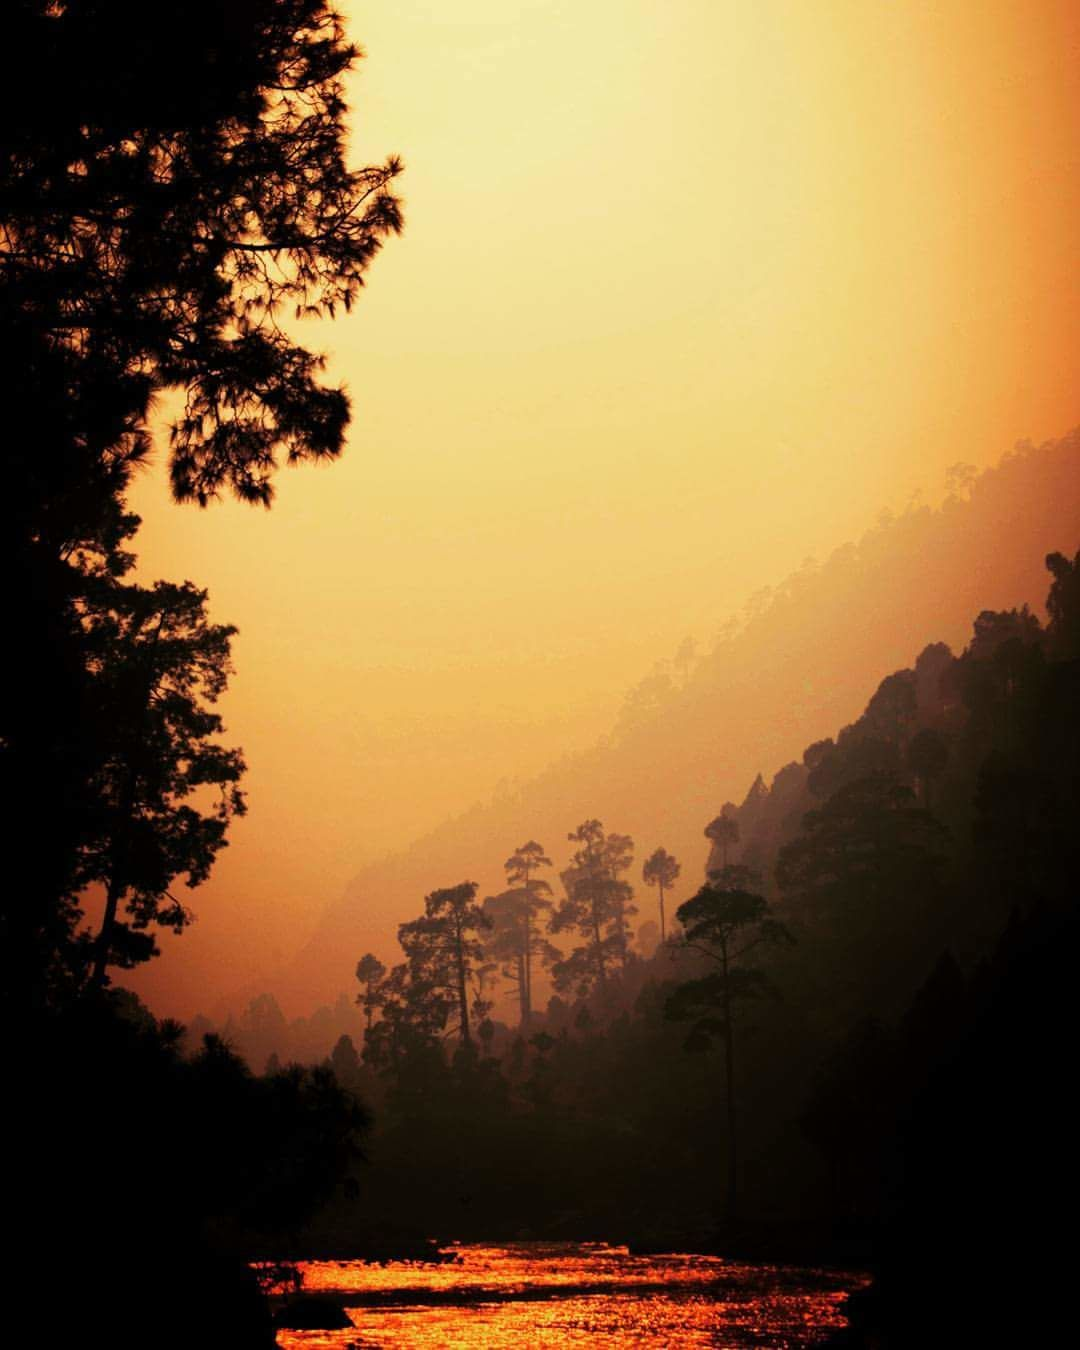 Photo of Sankri By ಕಾರ್ತಿಕ್ ಆರ್ ಮೂಡಲಗಿರಿ